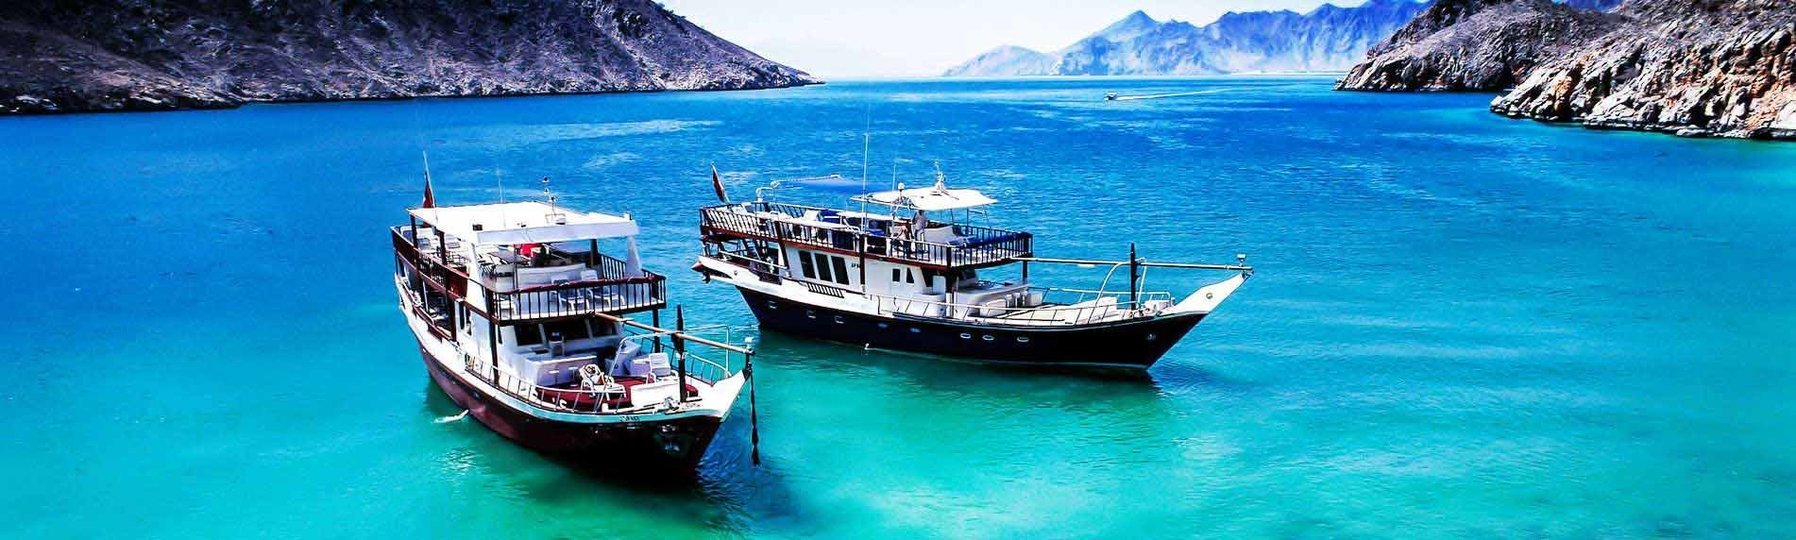 Oman Musandam Tour / Dibba Musandam Sea Safari - Tour